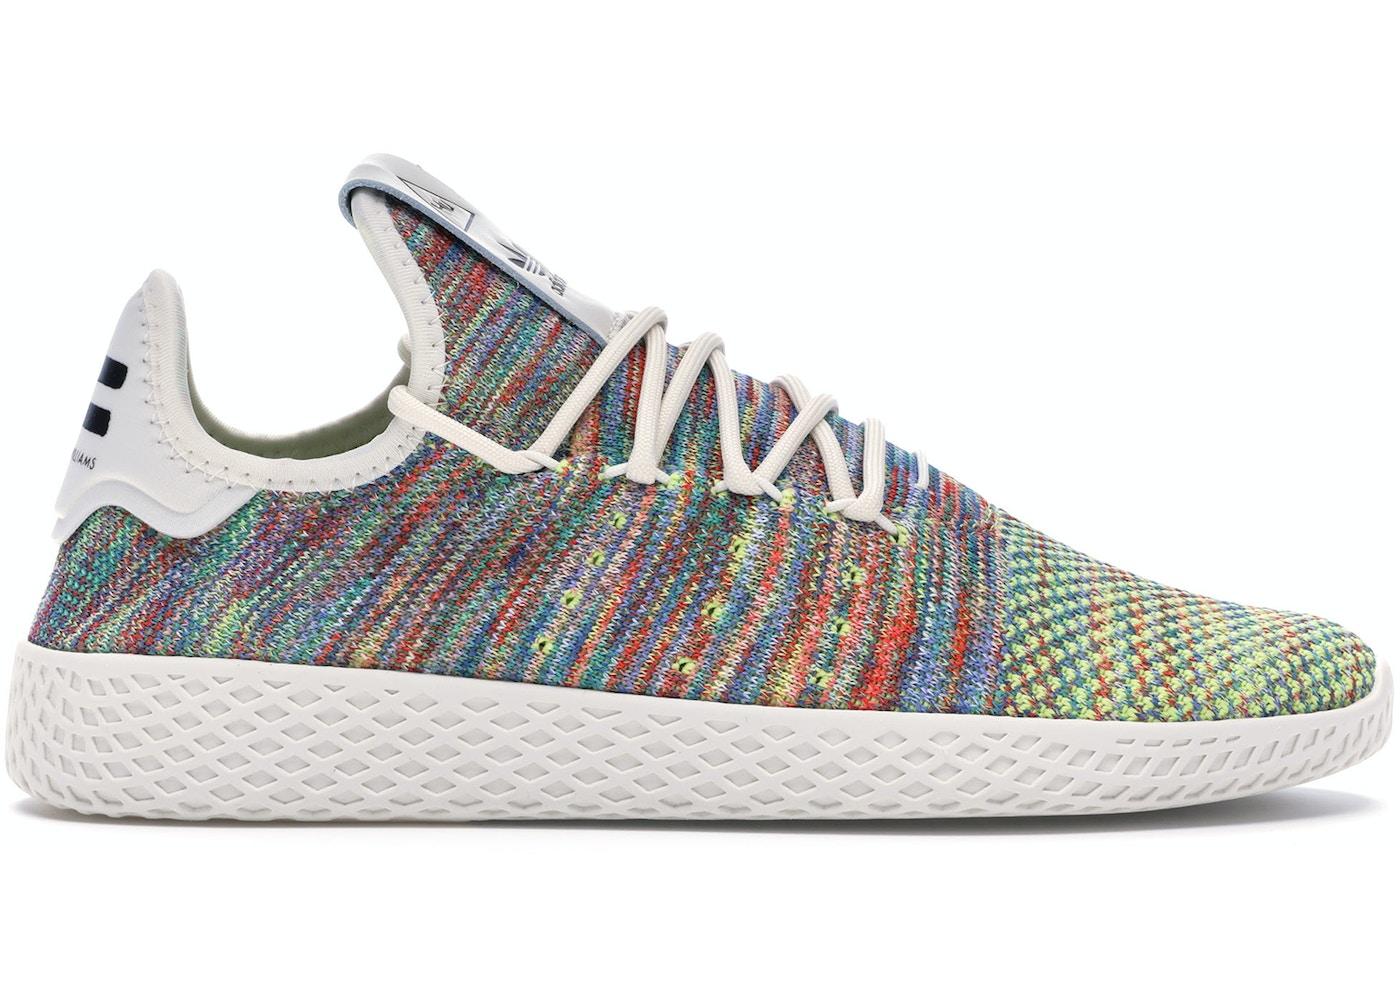 dd68702e55d13 adidas Tennis HU Pharrell Holi Multi-Color - CQ2631